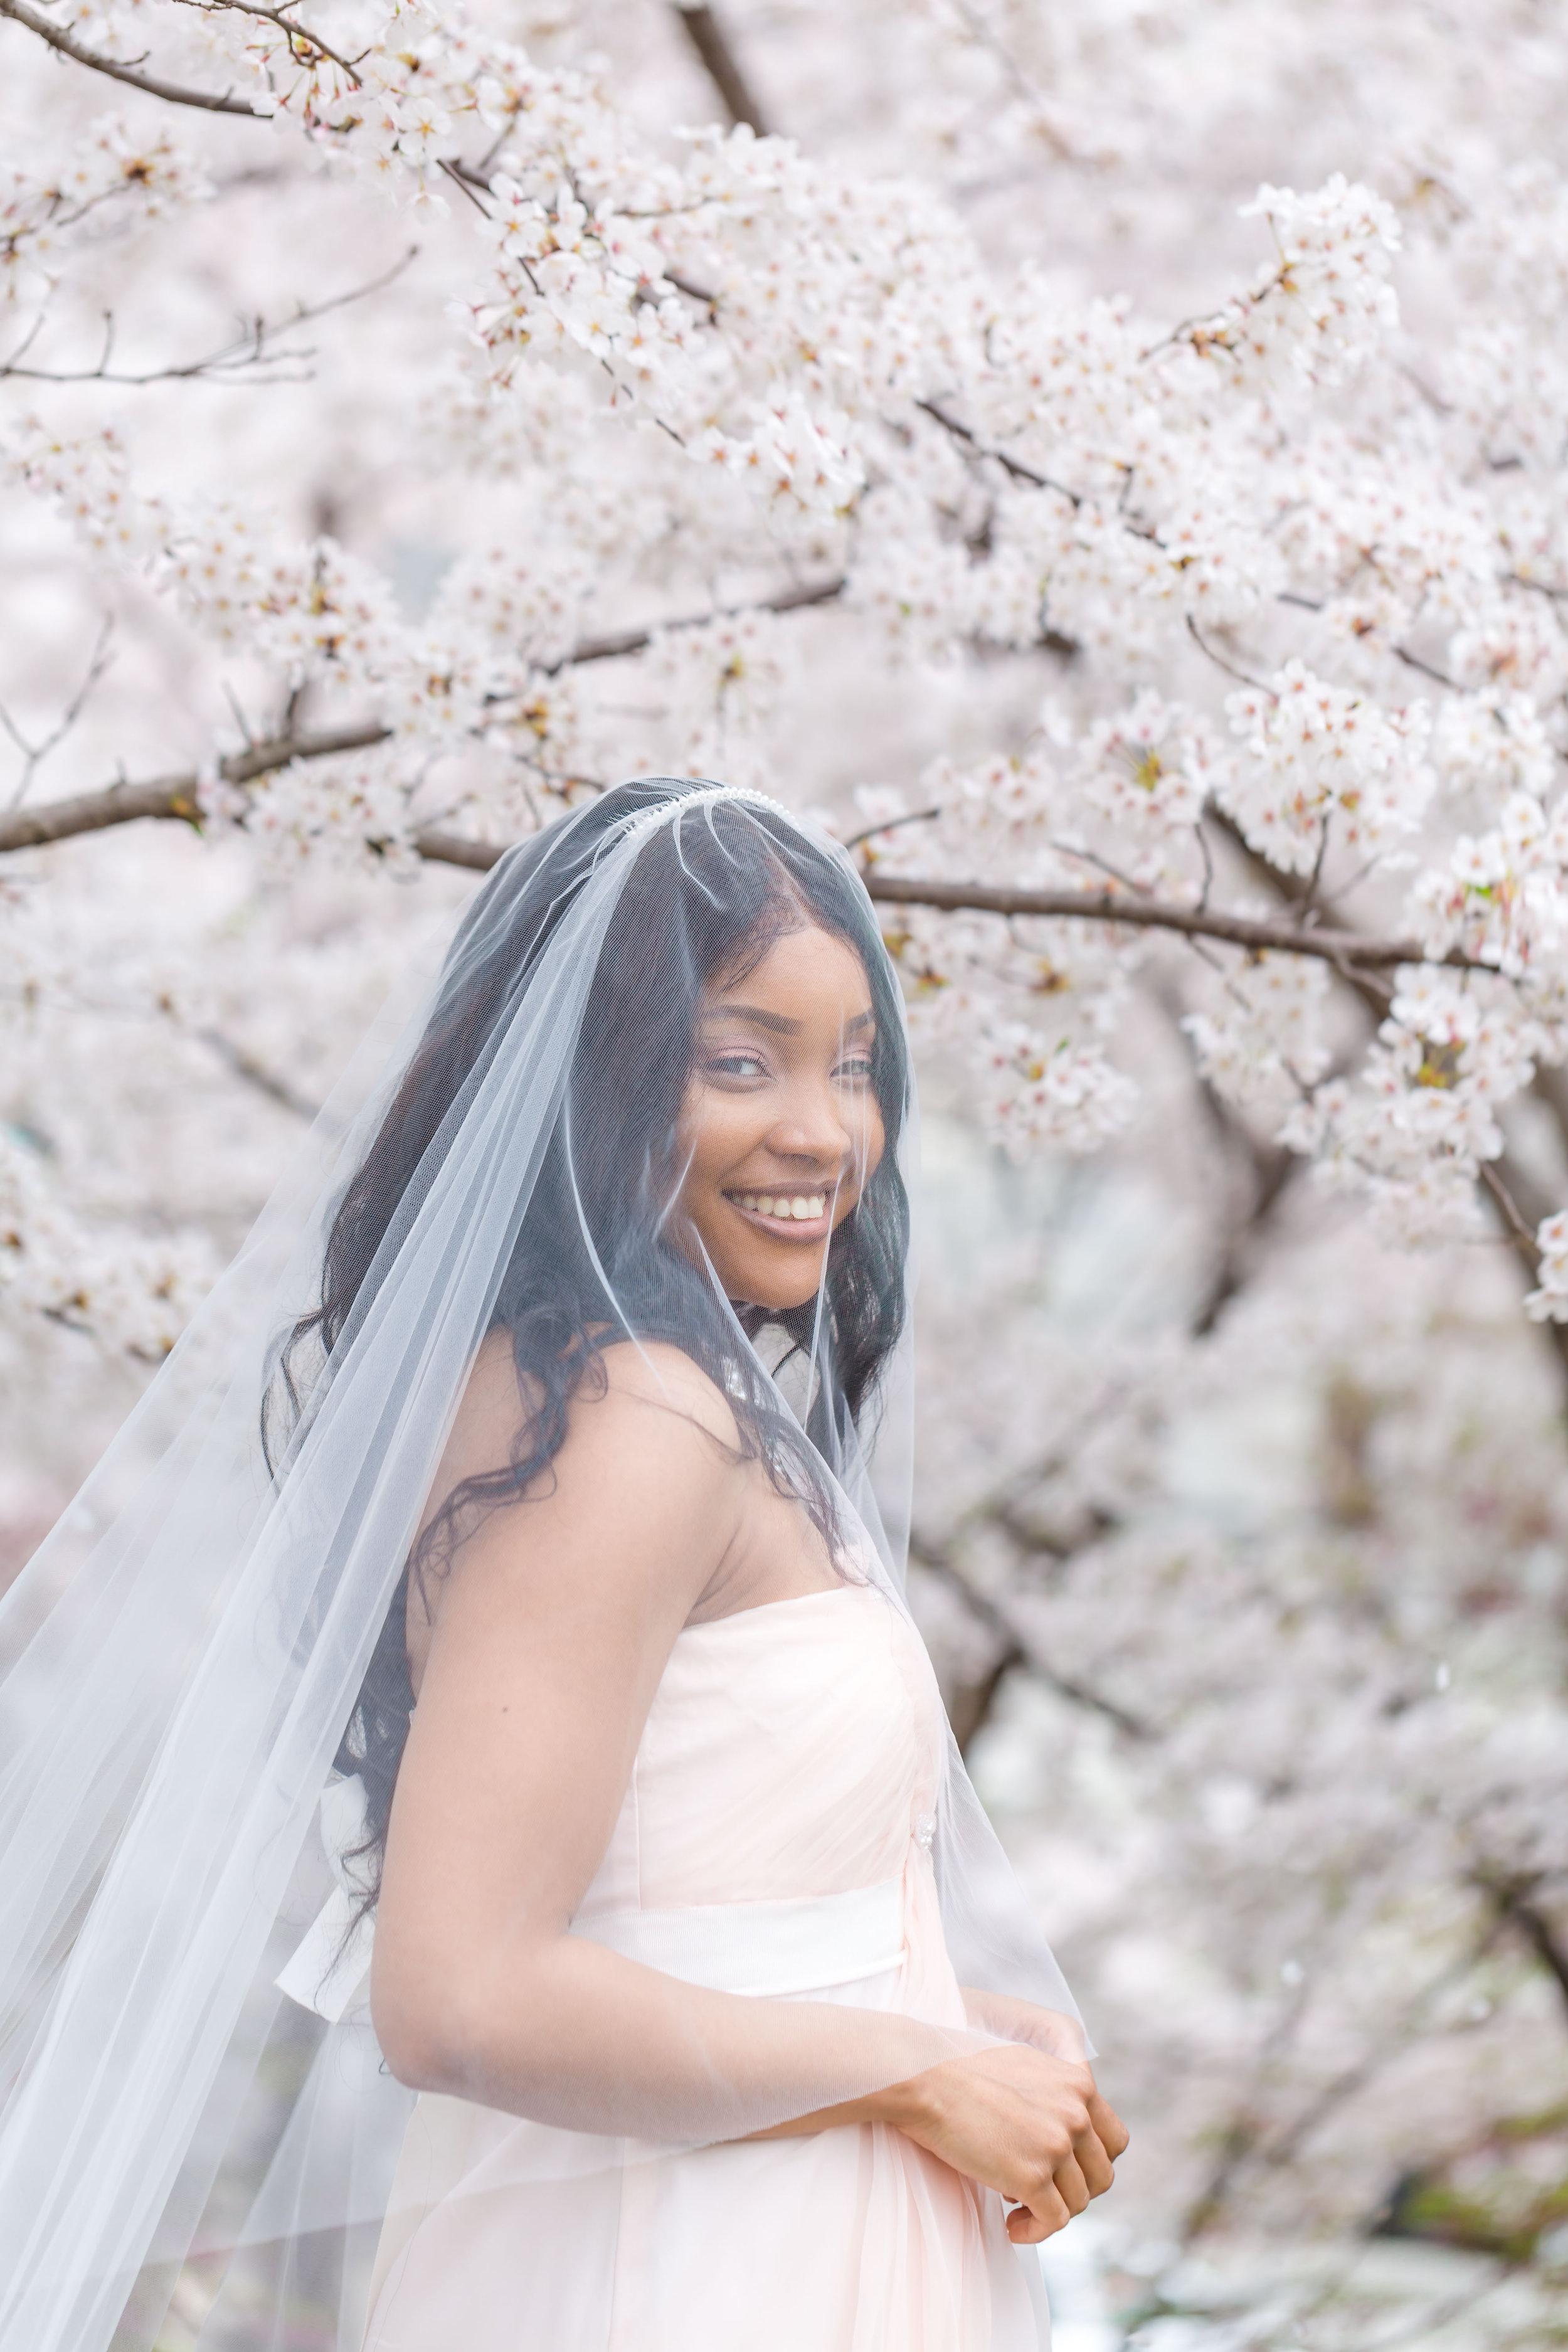 ScarlettExpressions-StyledShoot-Bridal-46.jpg